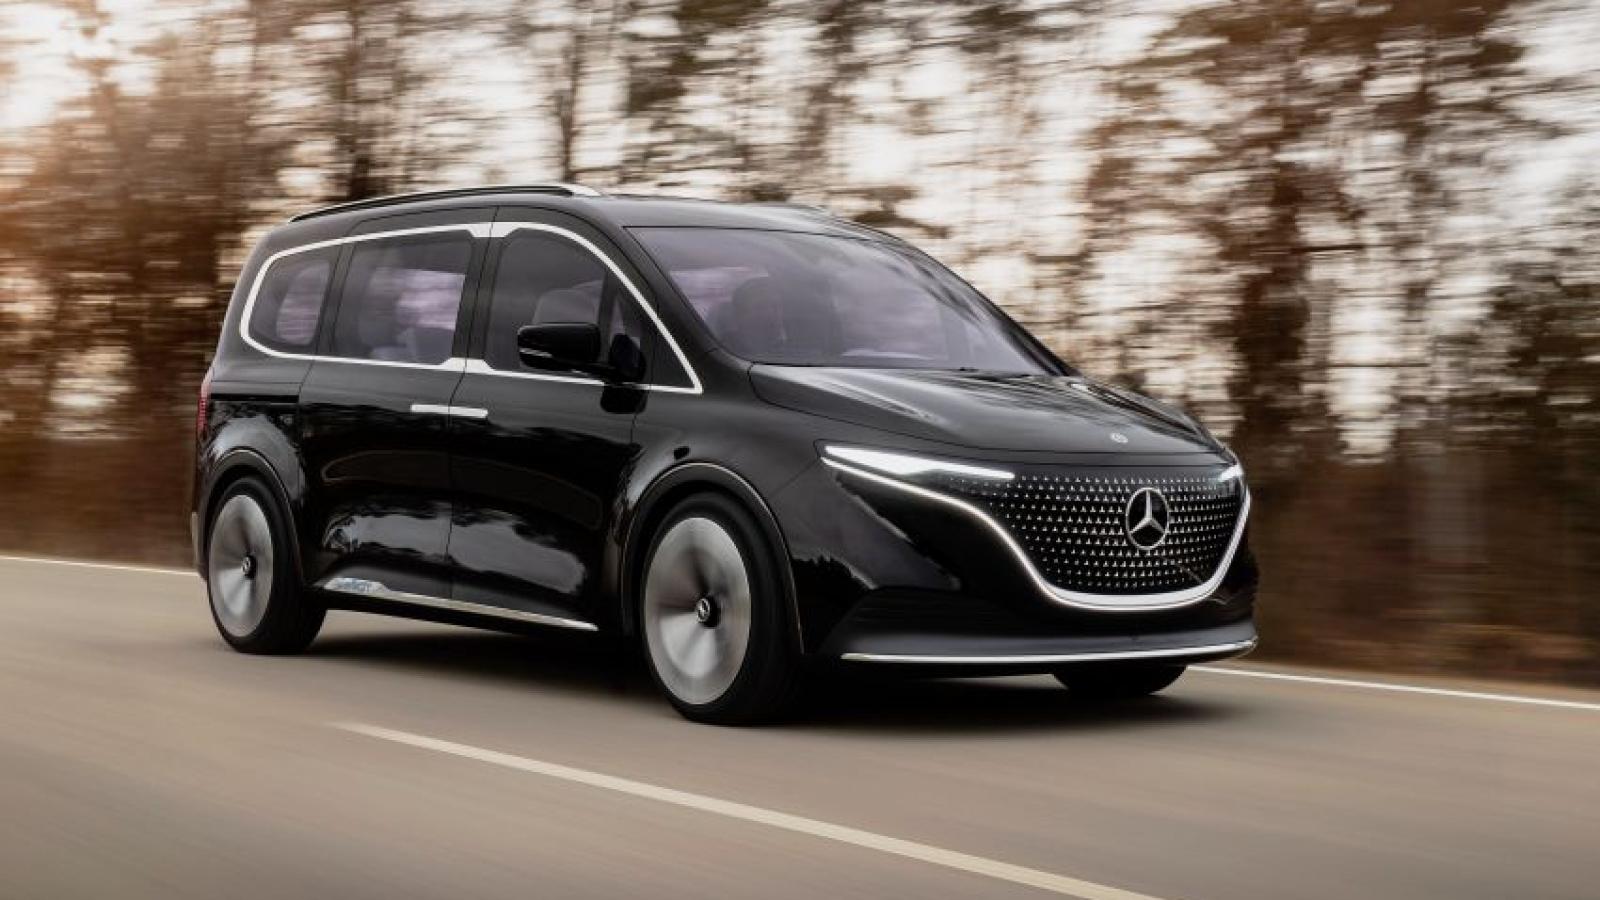 Mercedes-Benz tung concept xe MPV thuần điện